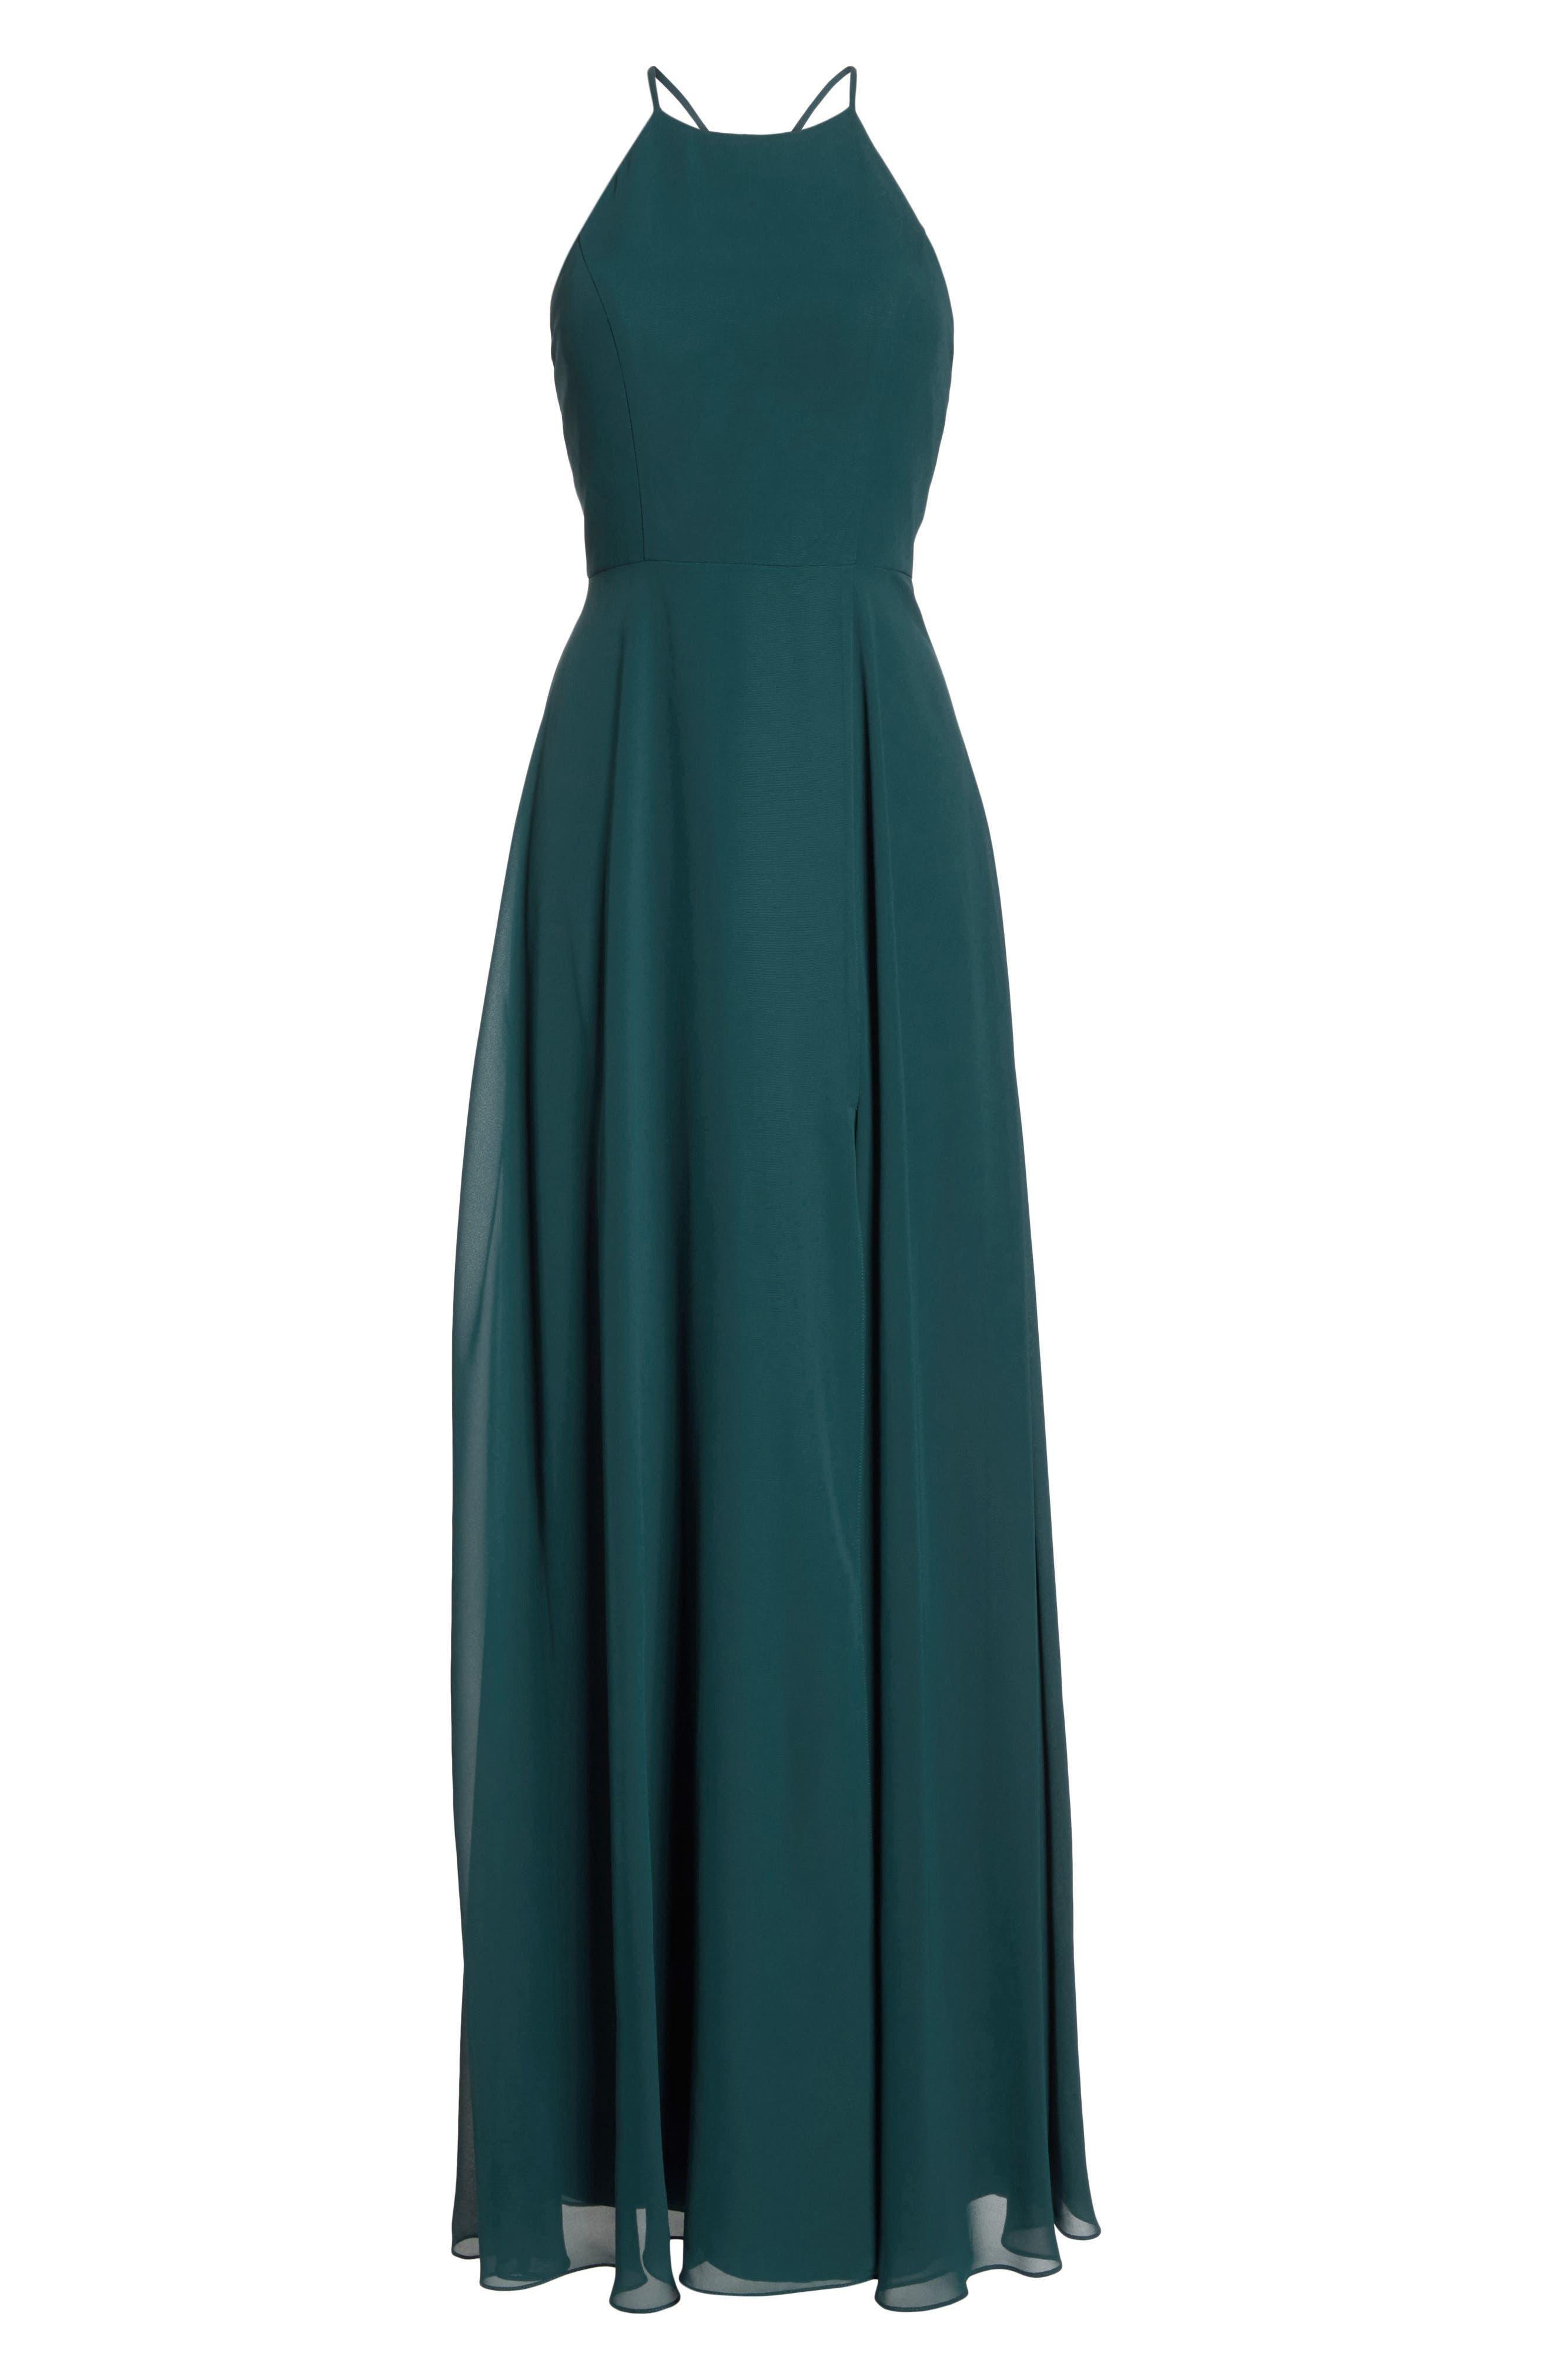 JENNY YOO, Kayla A-Line Halter Gown, Alternate thumbnail 8, color, CASPIAN SEA